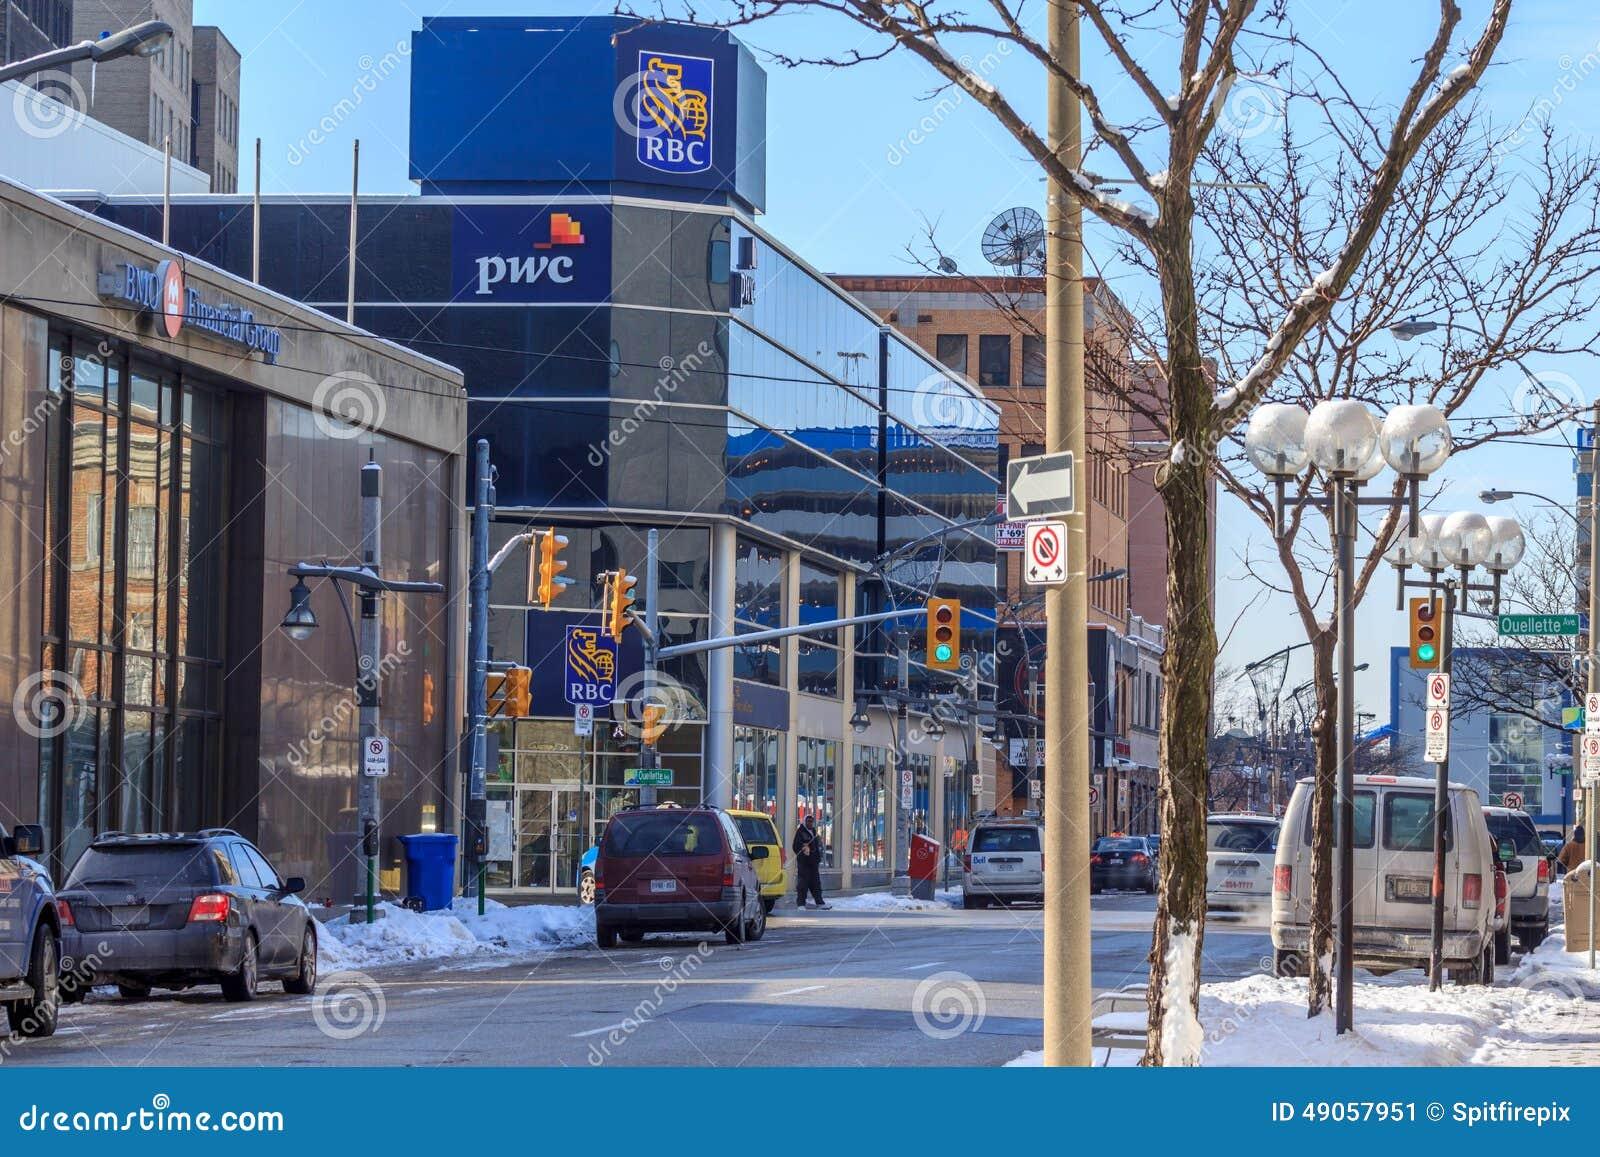 Scotiabank — Banks in Brockville, Ontario, Canada